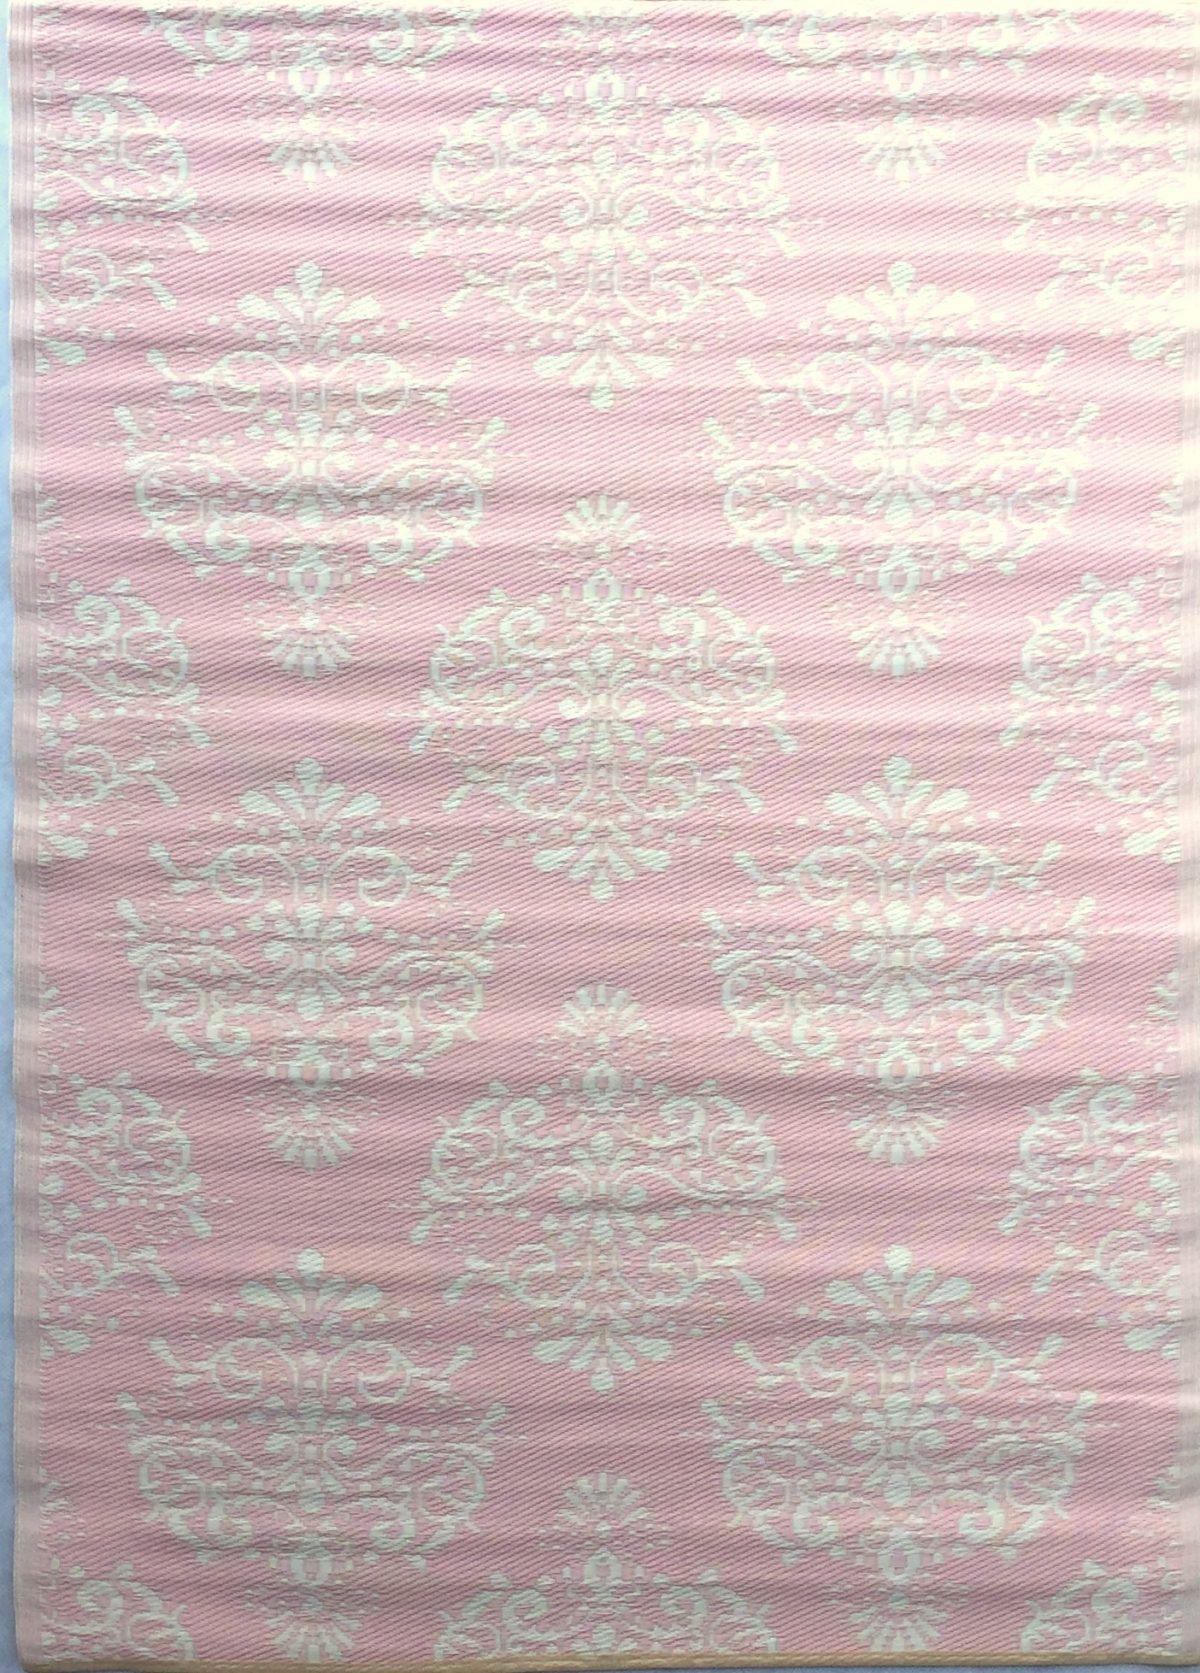 Plastic buitentapijt zambia roze 2